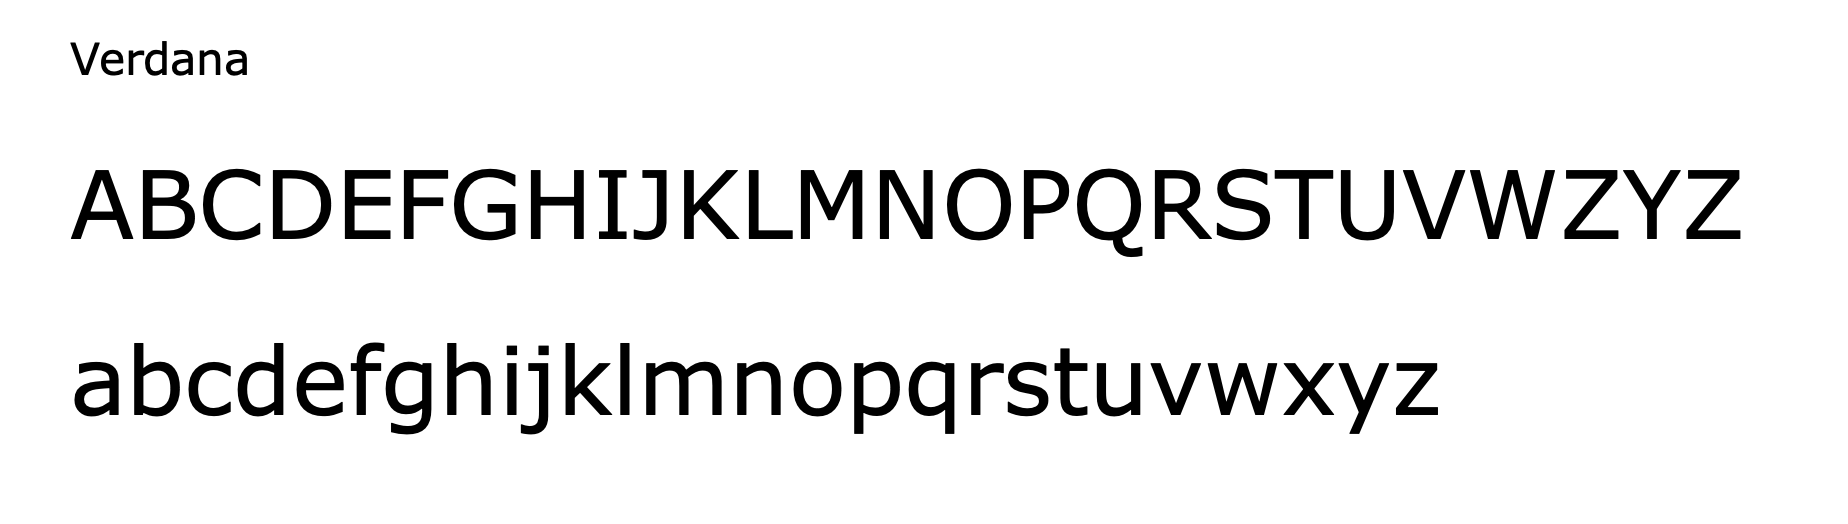 Verdana - classic email signature font